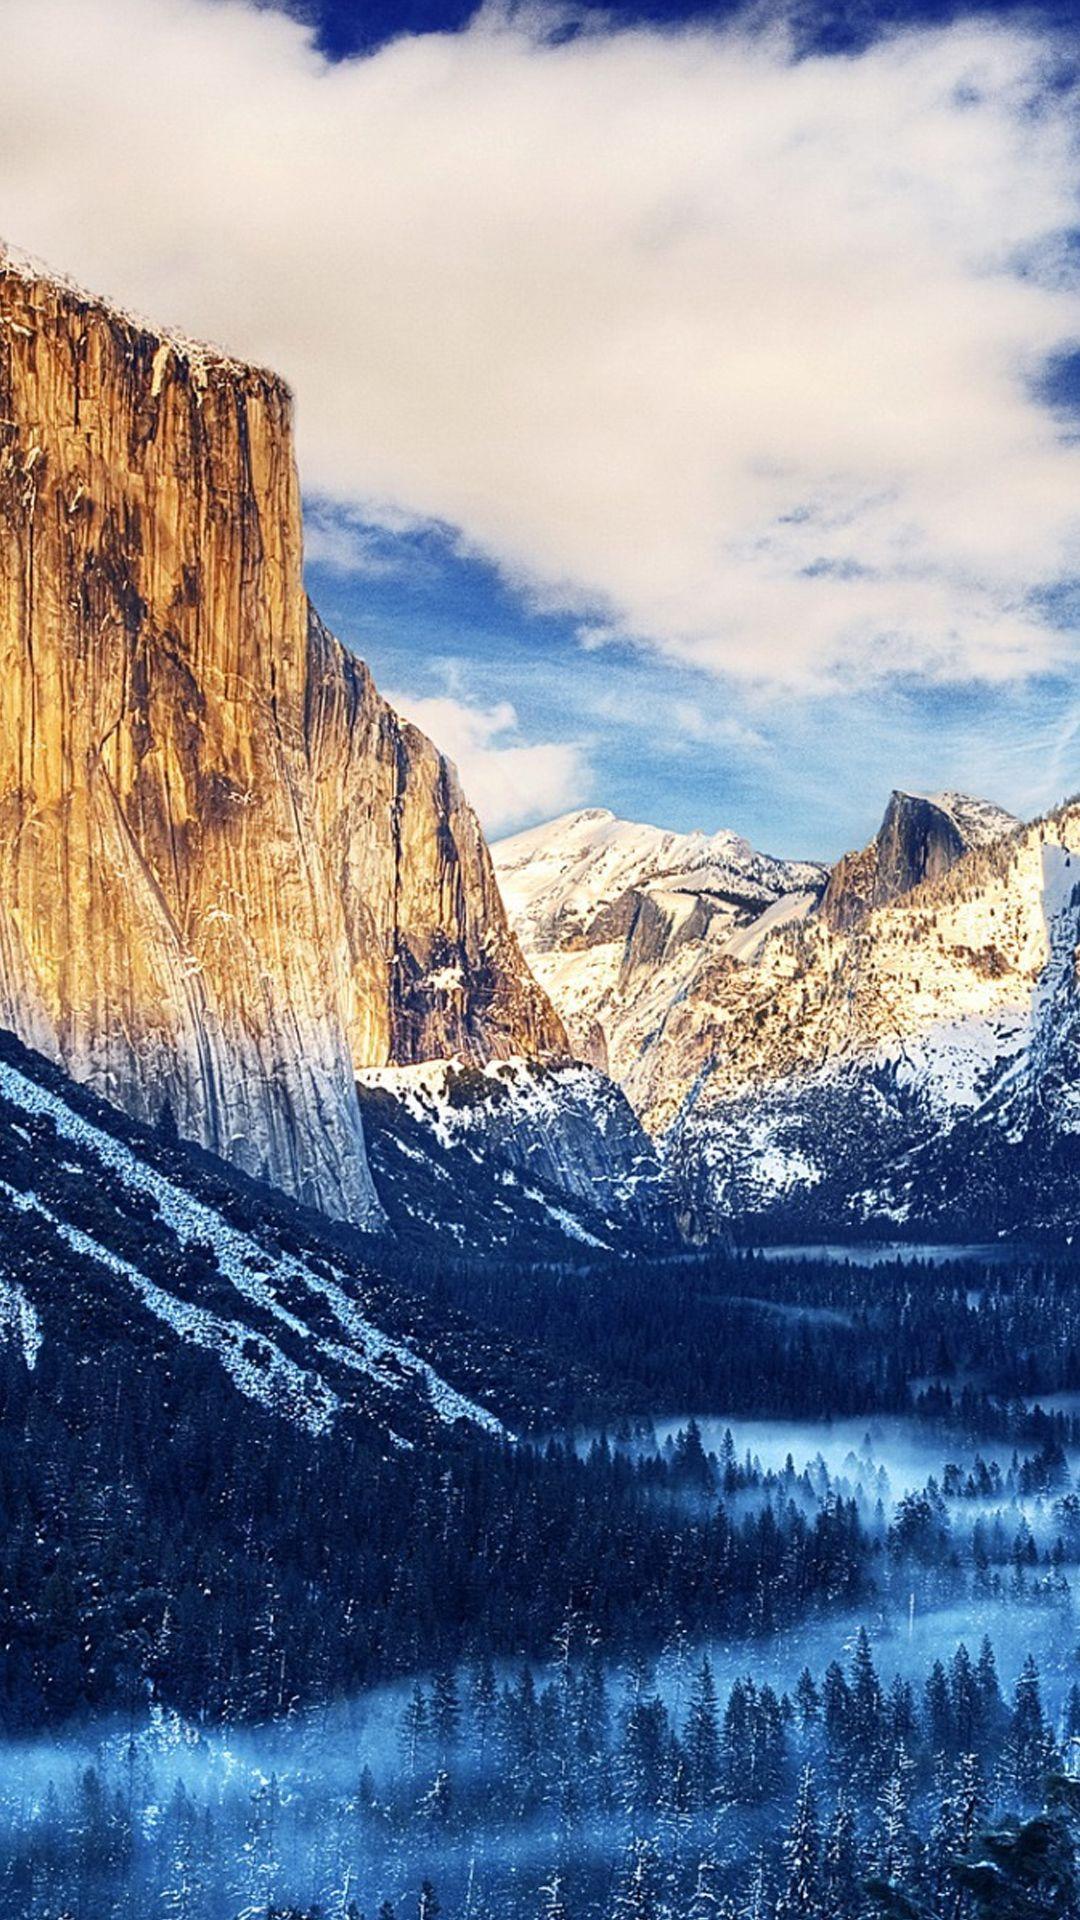 High Resolution Yosemite Phone Wallpaper Iphone Wallpaper Winter Landscape Wallpaper Nature Iphone Wallpaper